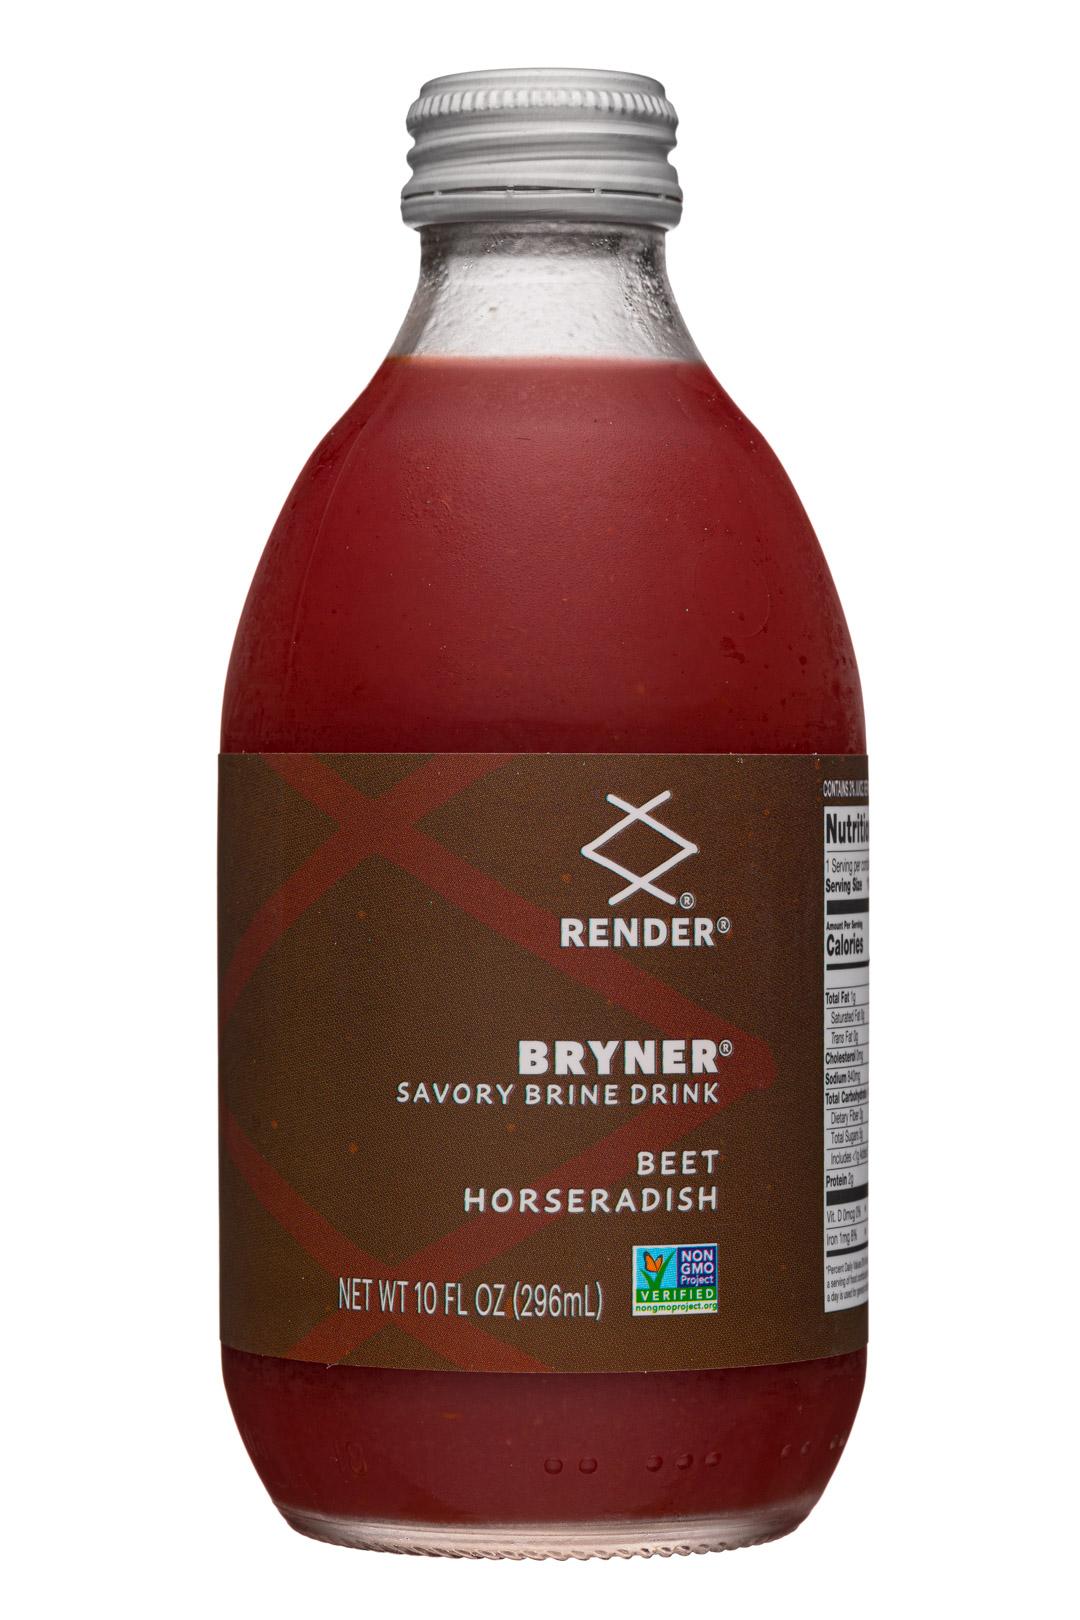 Bryner - Beet Horseradish